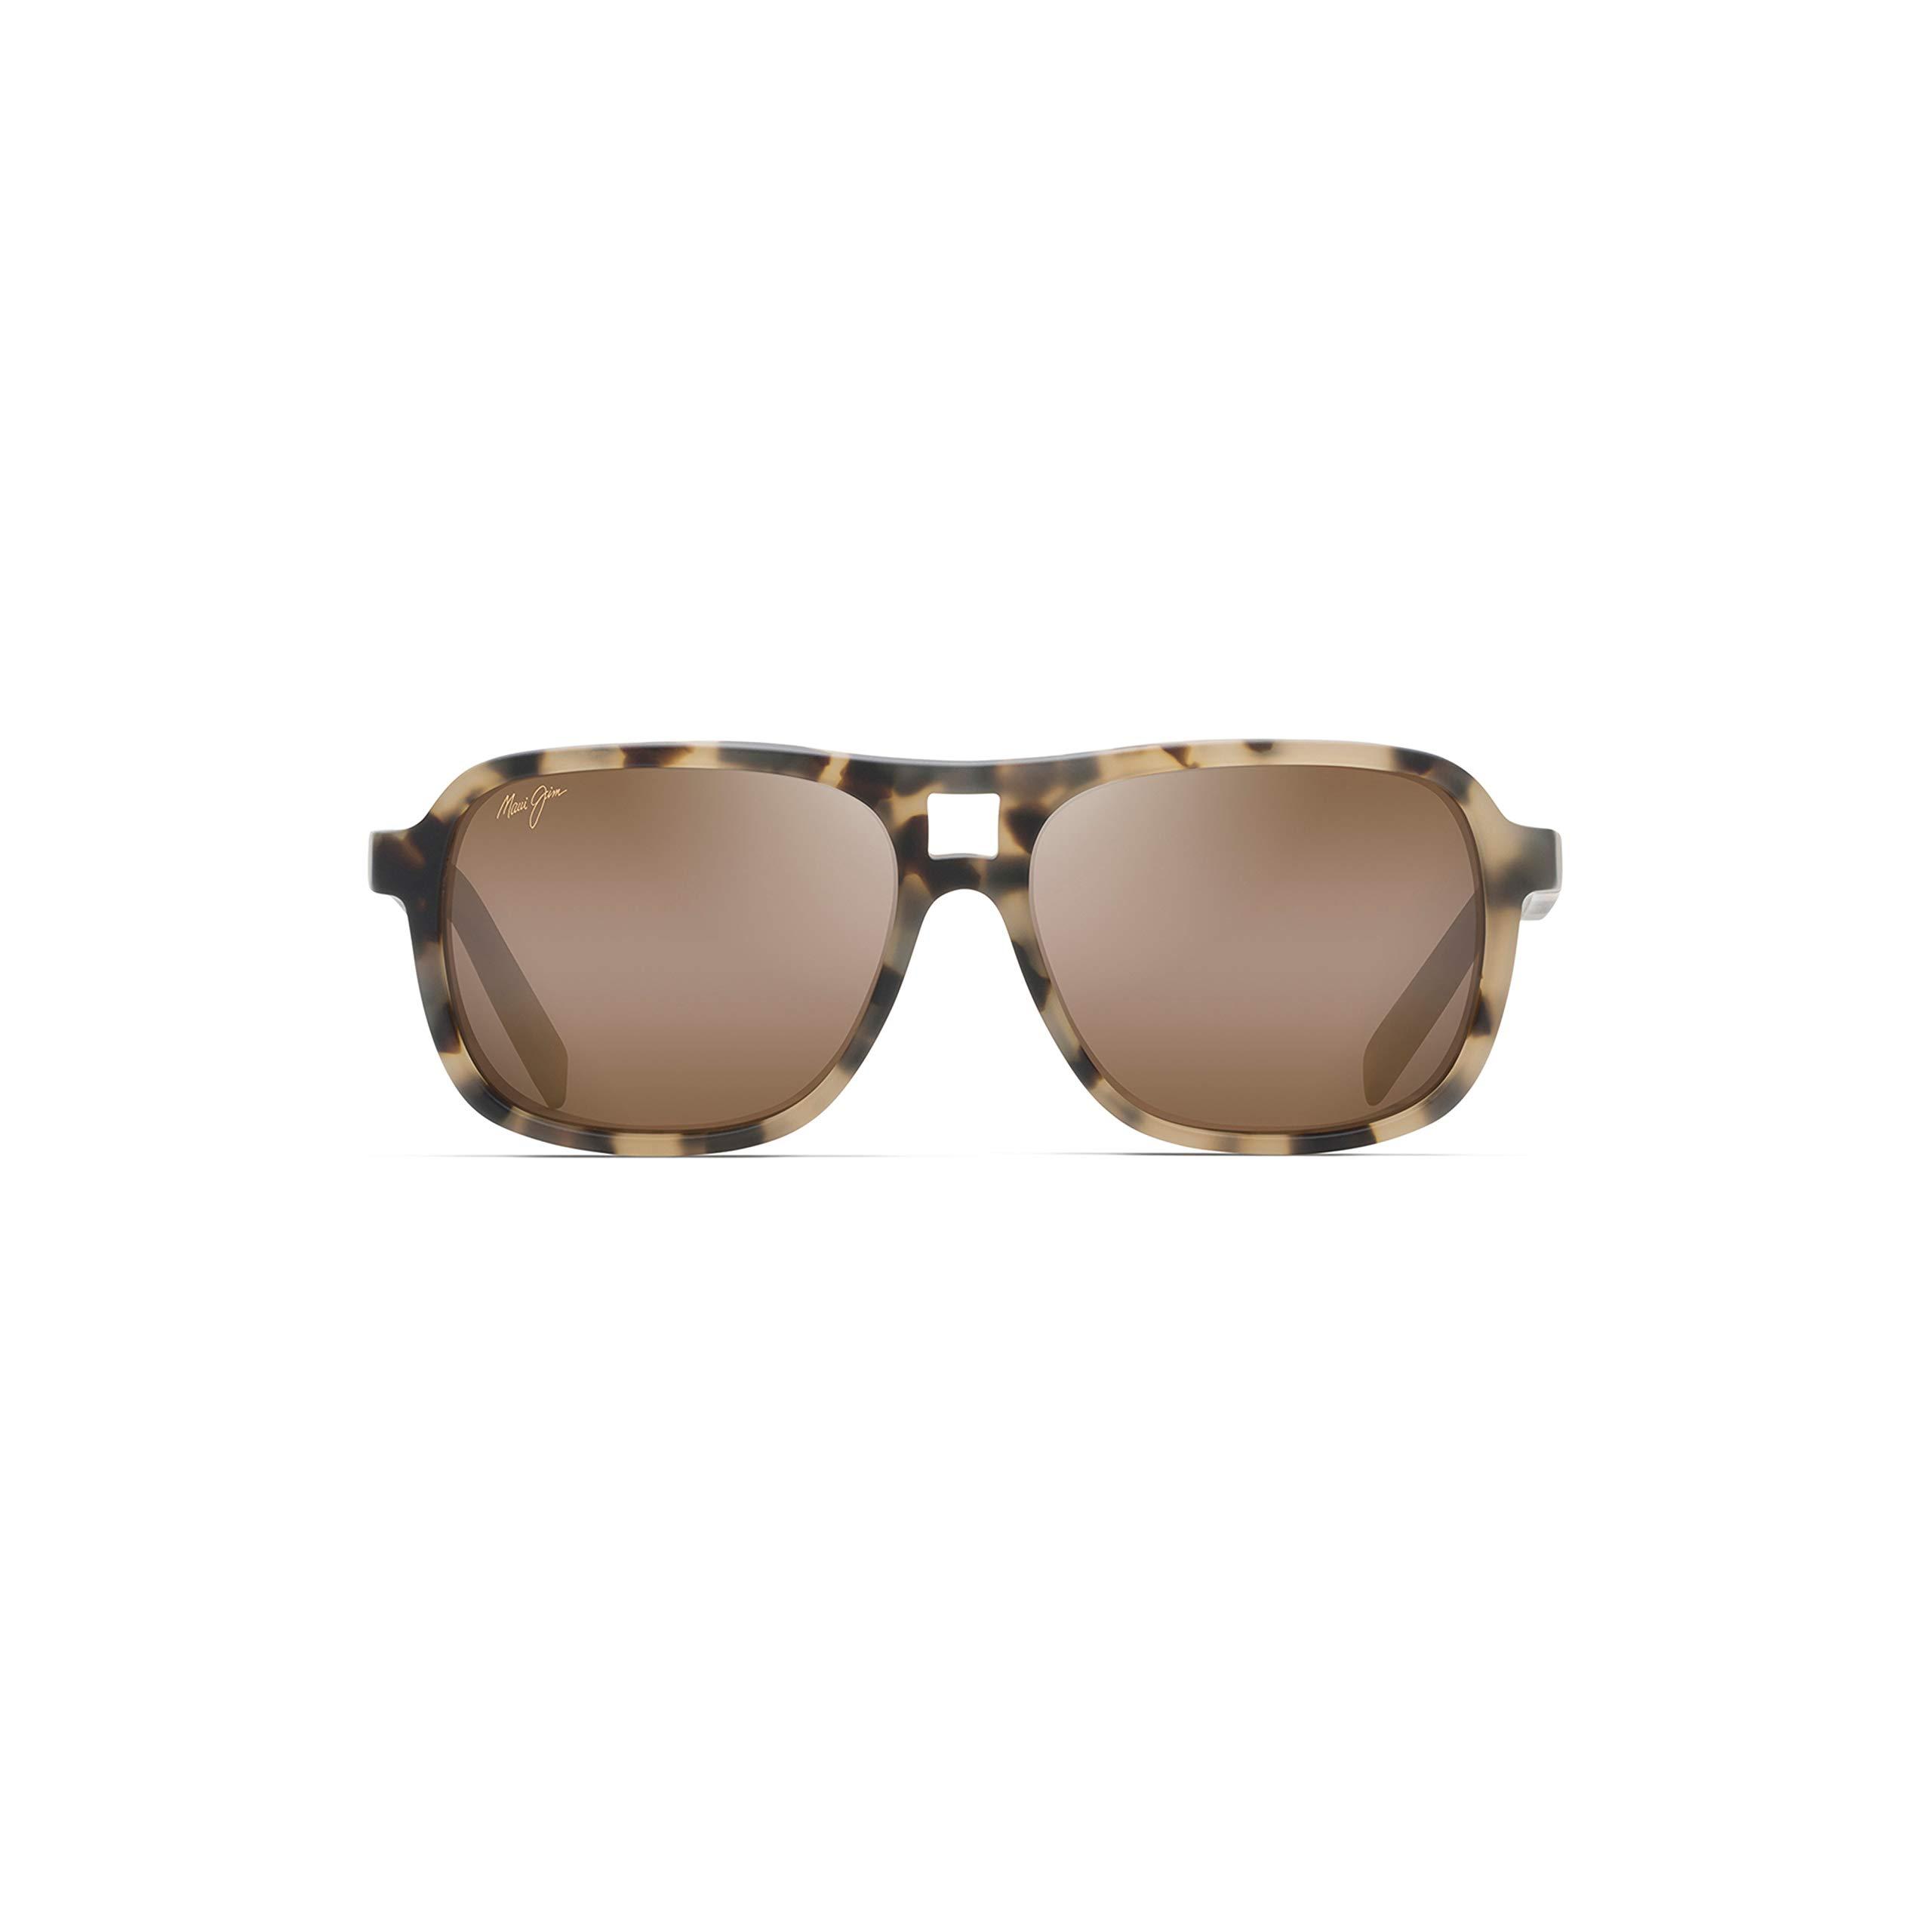 ویکالا · خرید  اصل اورجینال · خرید از آمازون · Maui Jim Little Maks H771-10ML | Polarized Matte Tokyo Tortoise Aviator Frame Sunglasses, HCL Bronze Lenses, with Patented PolarizedPlus2 Lens Technology wekala · ویکالا